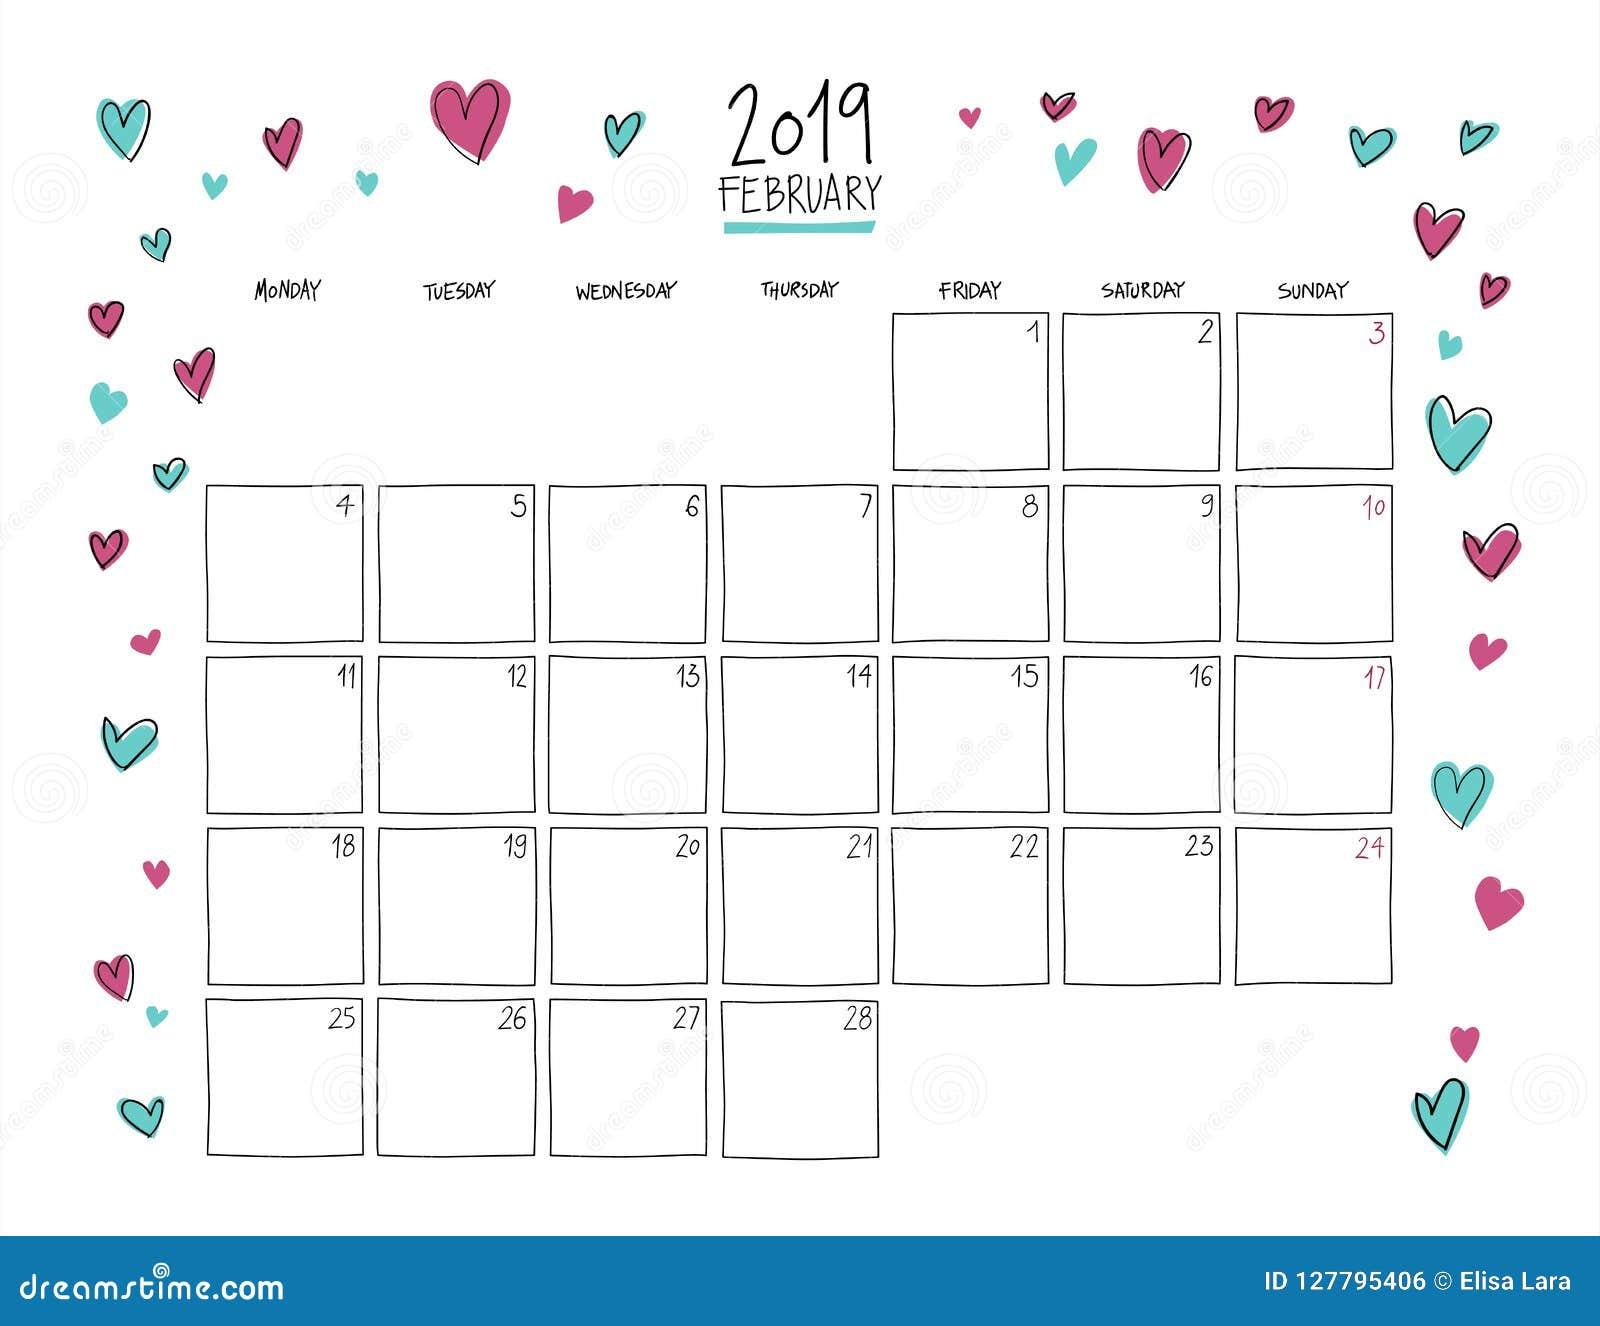 Horizontal Calendar Of February 2019 February 2019 Wall Calendar. Doodle Style. Stock Vector